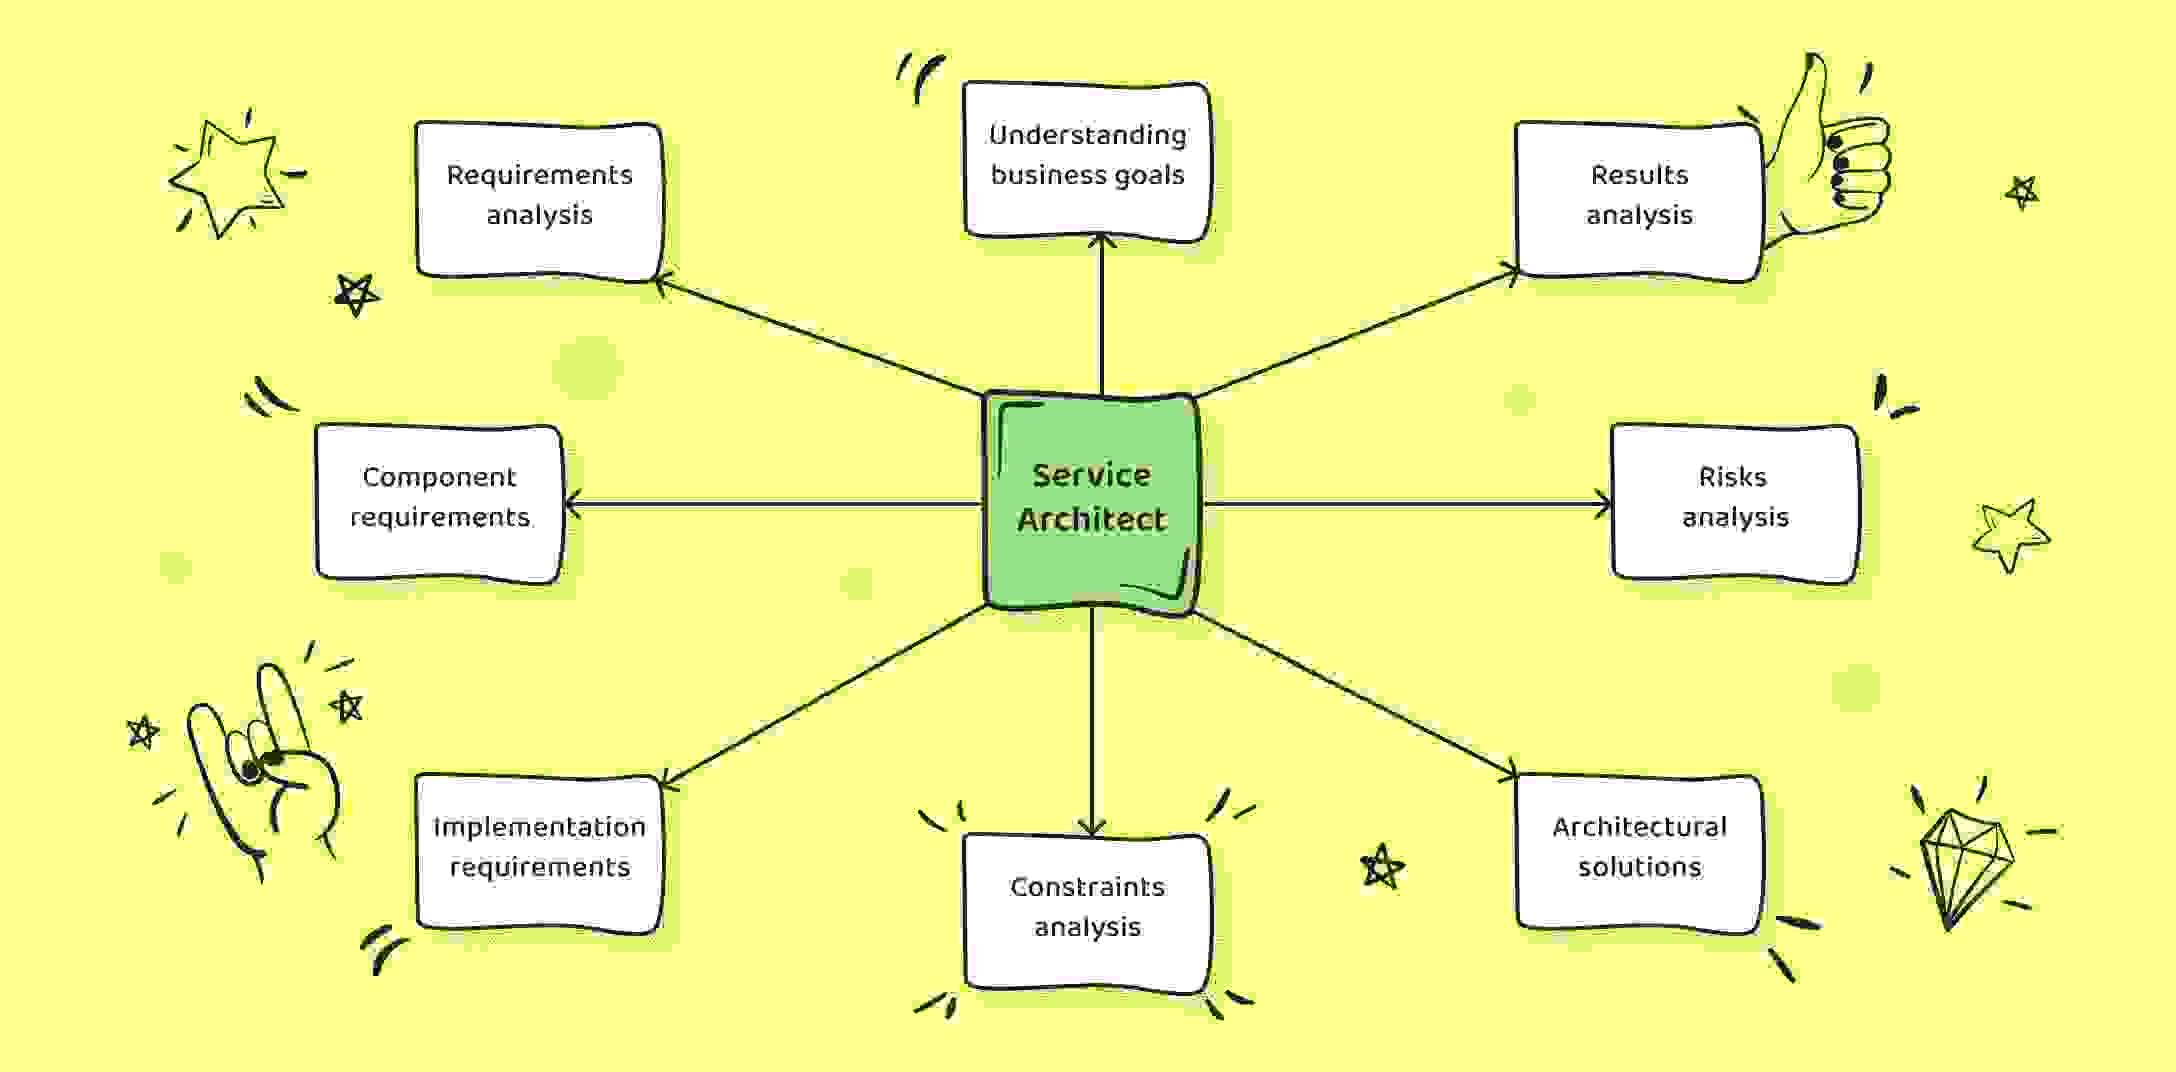 A scheme showing Service Architect responsibilities